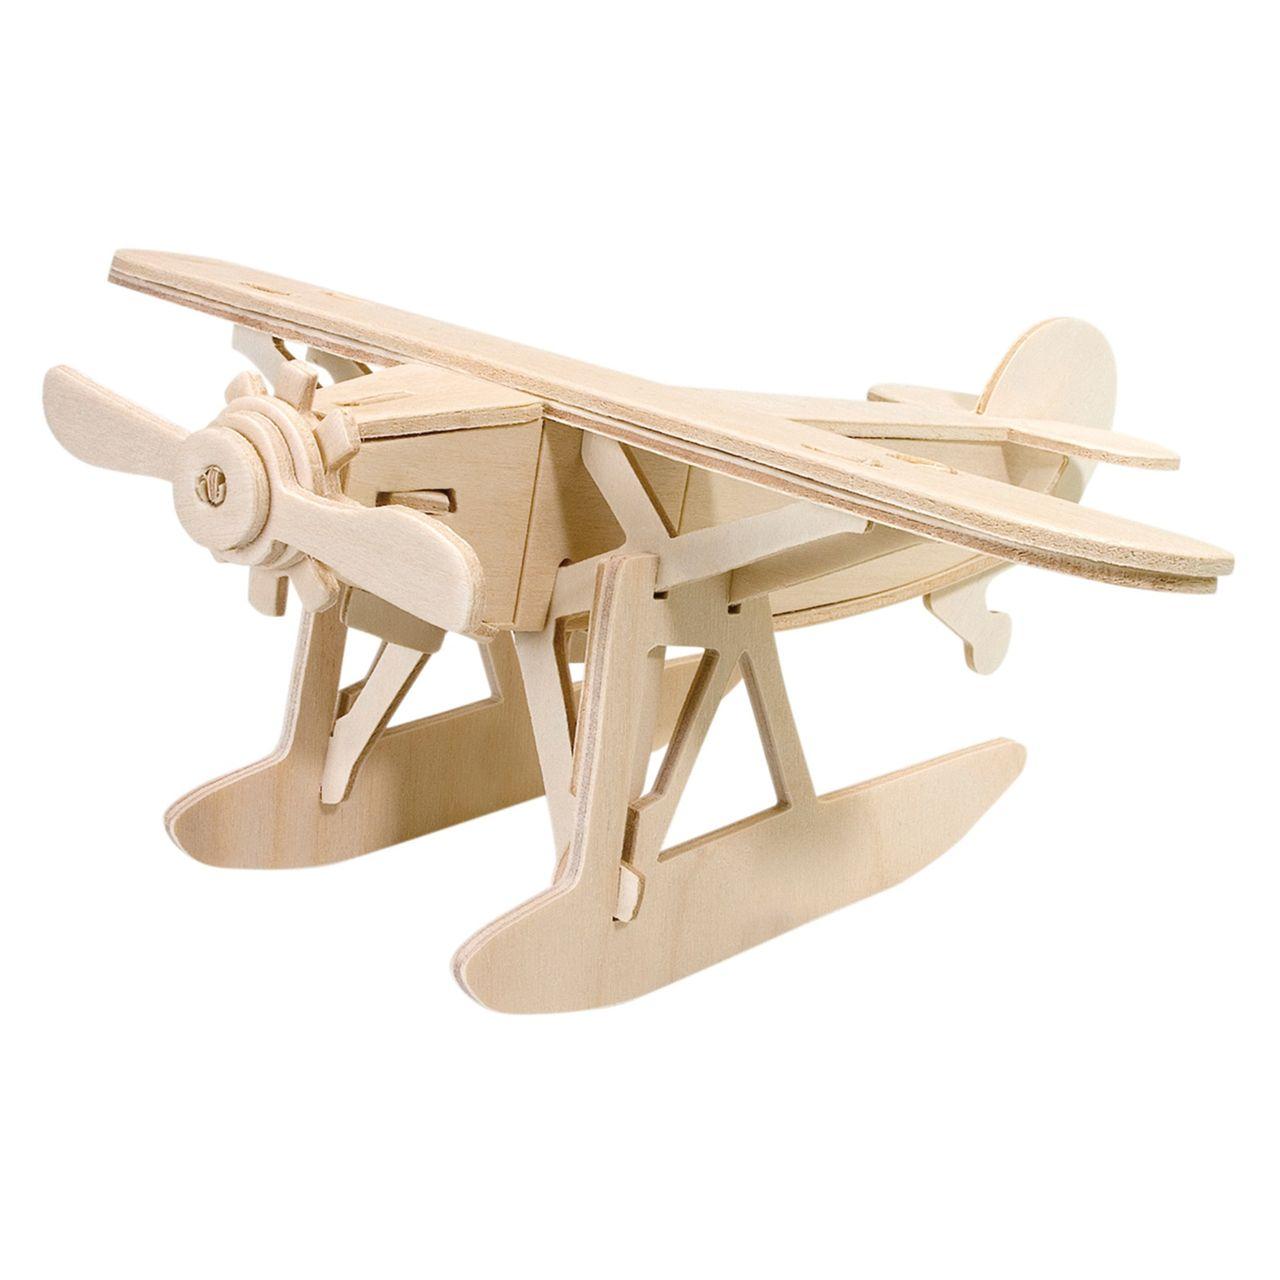 PEBRAO Holzbausatz Wasserflugzeug